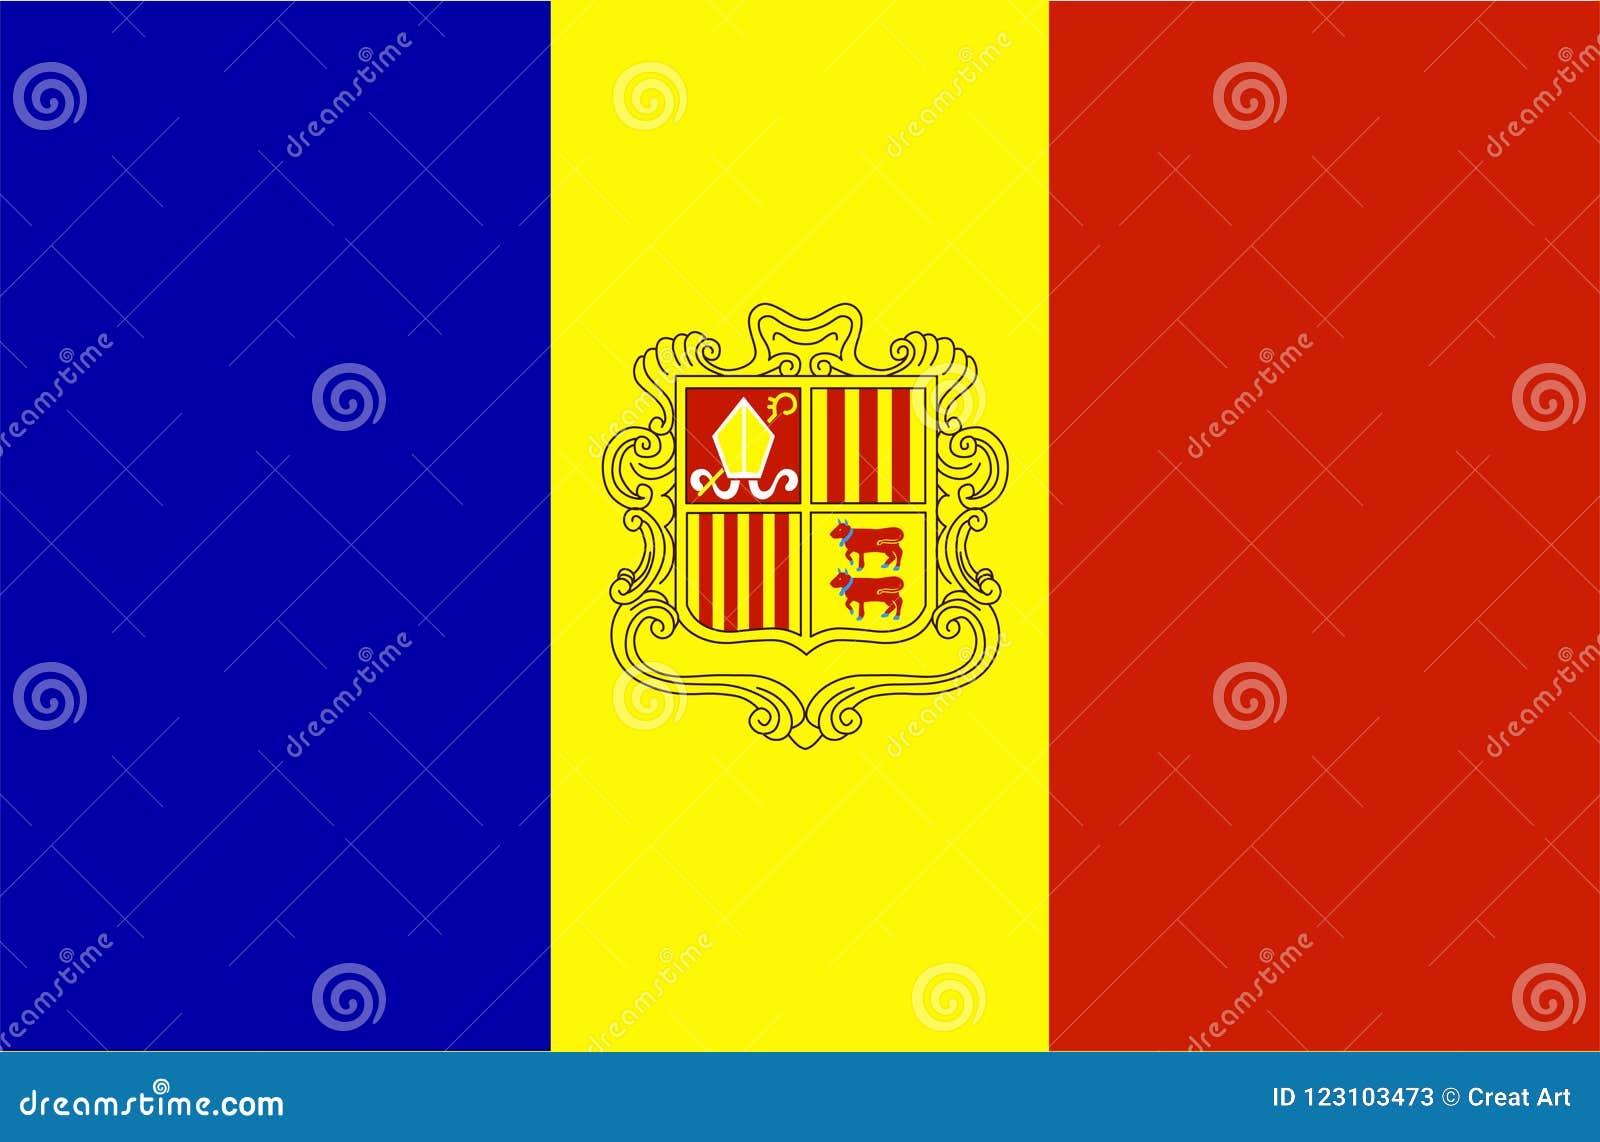 Andorra flag vector.Illustration of Andorra national flag